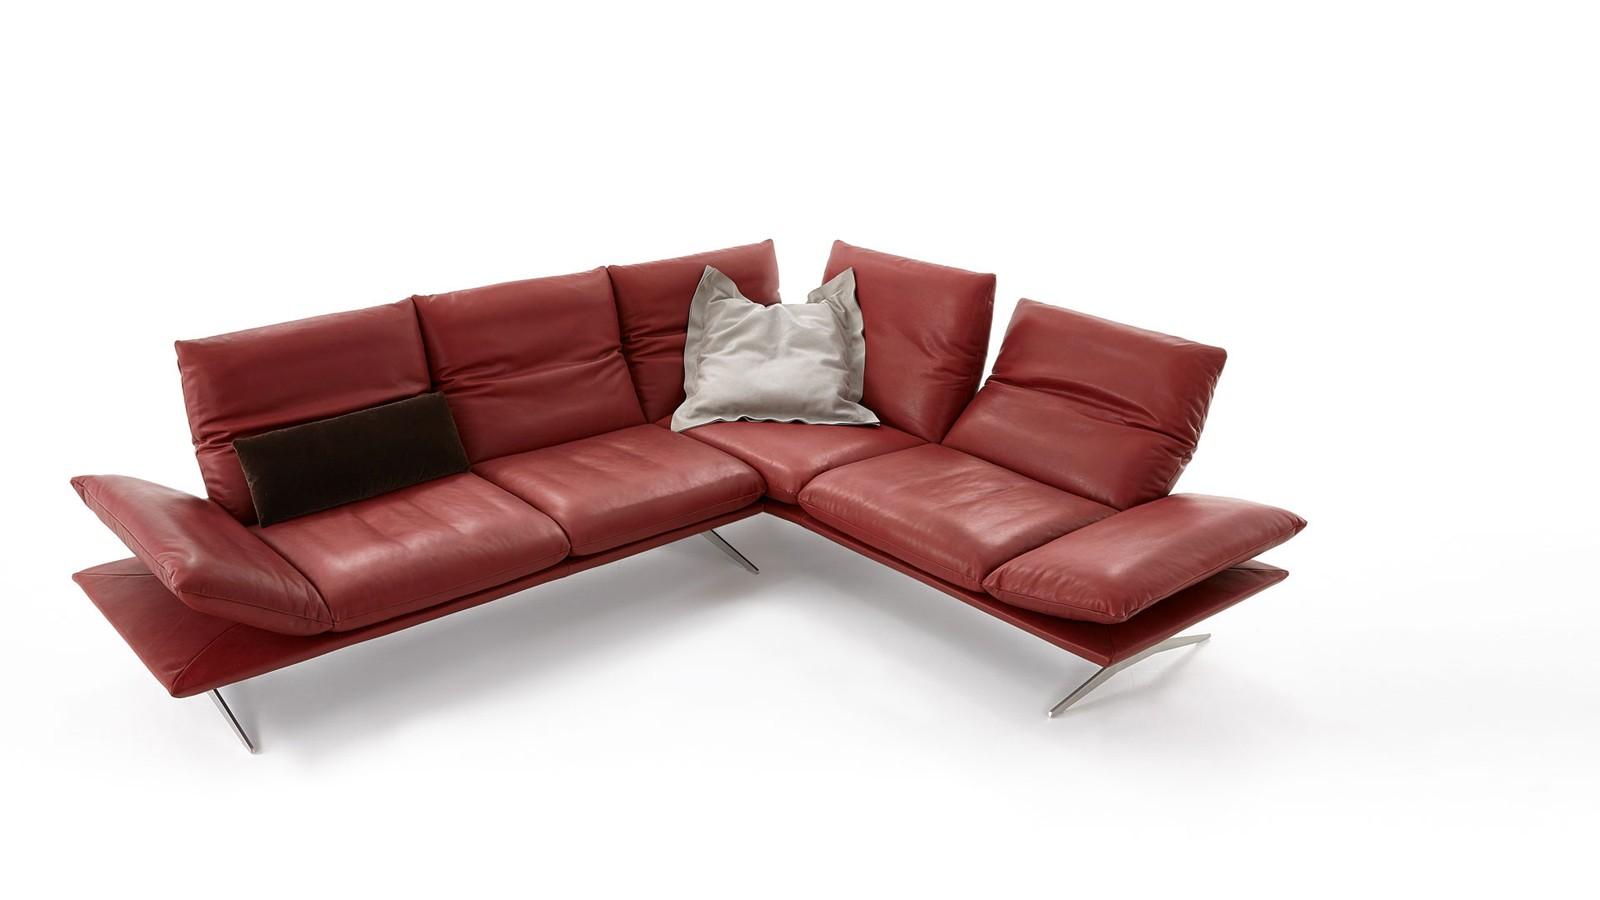 Canapea modernă Koinor Francis